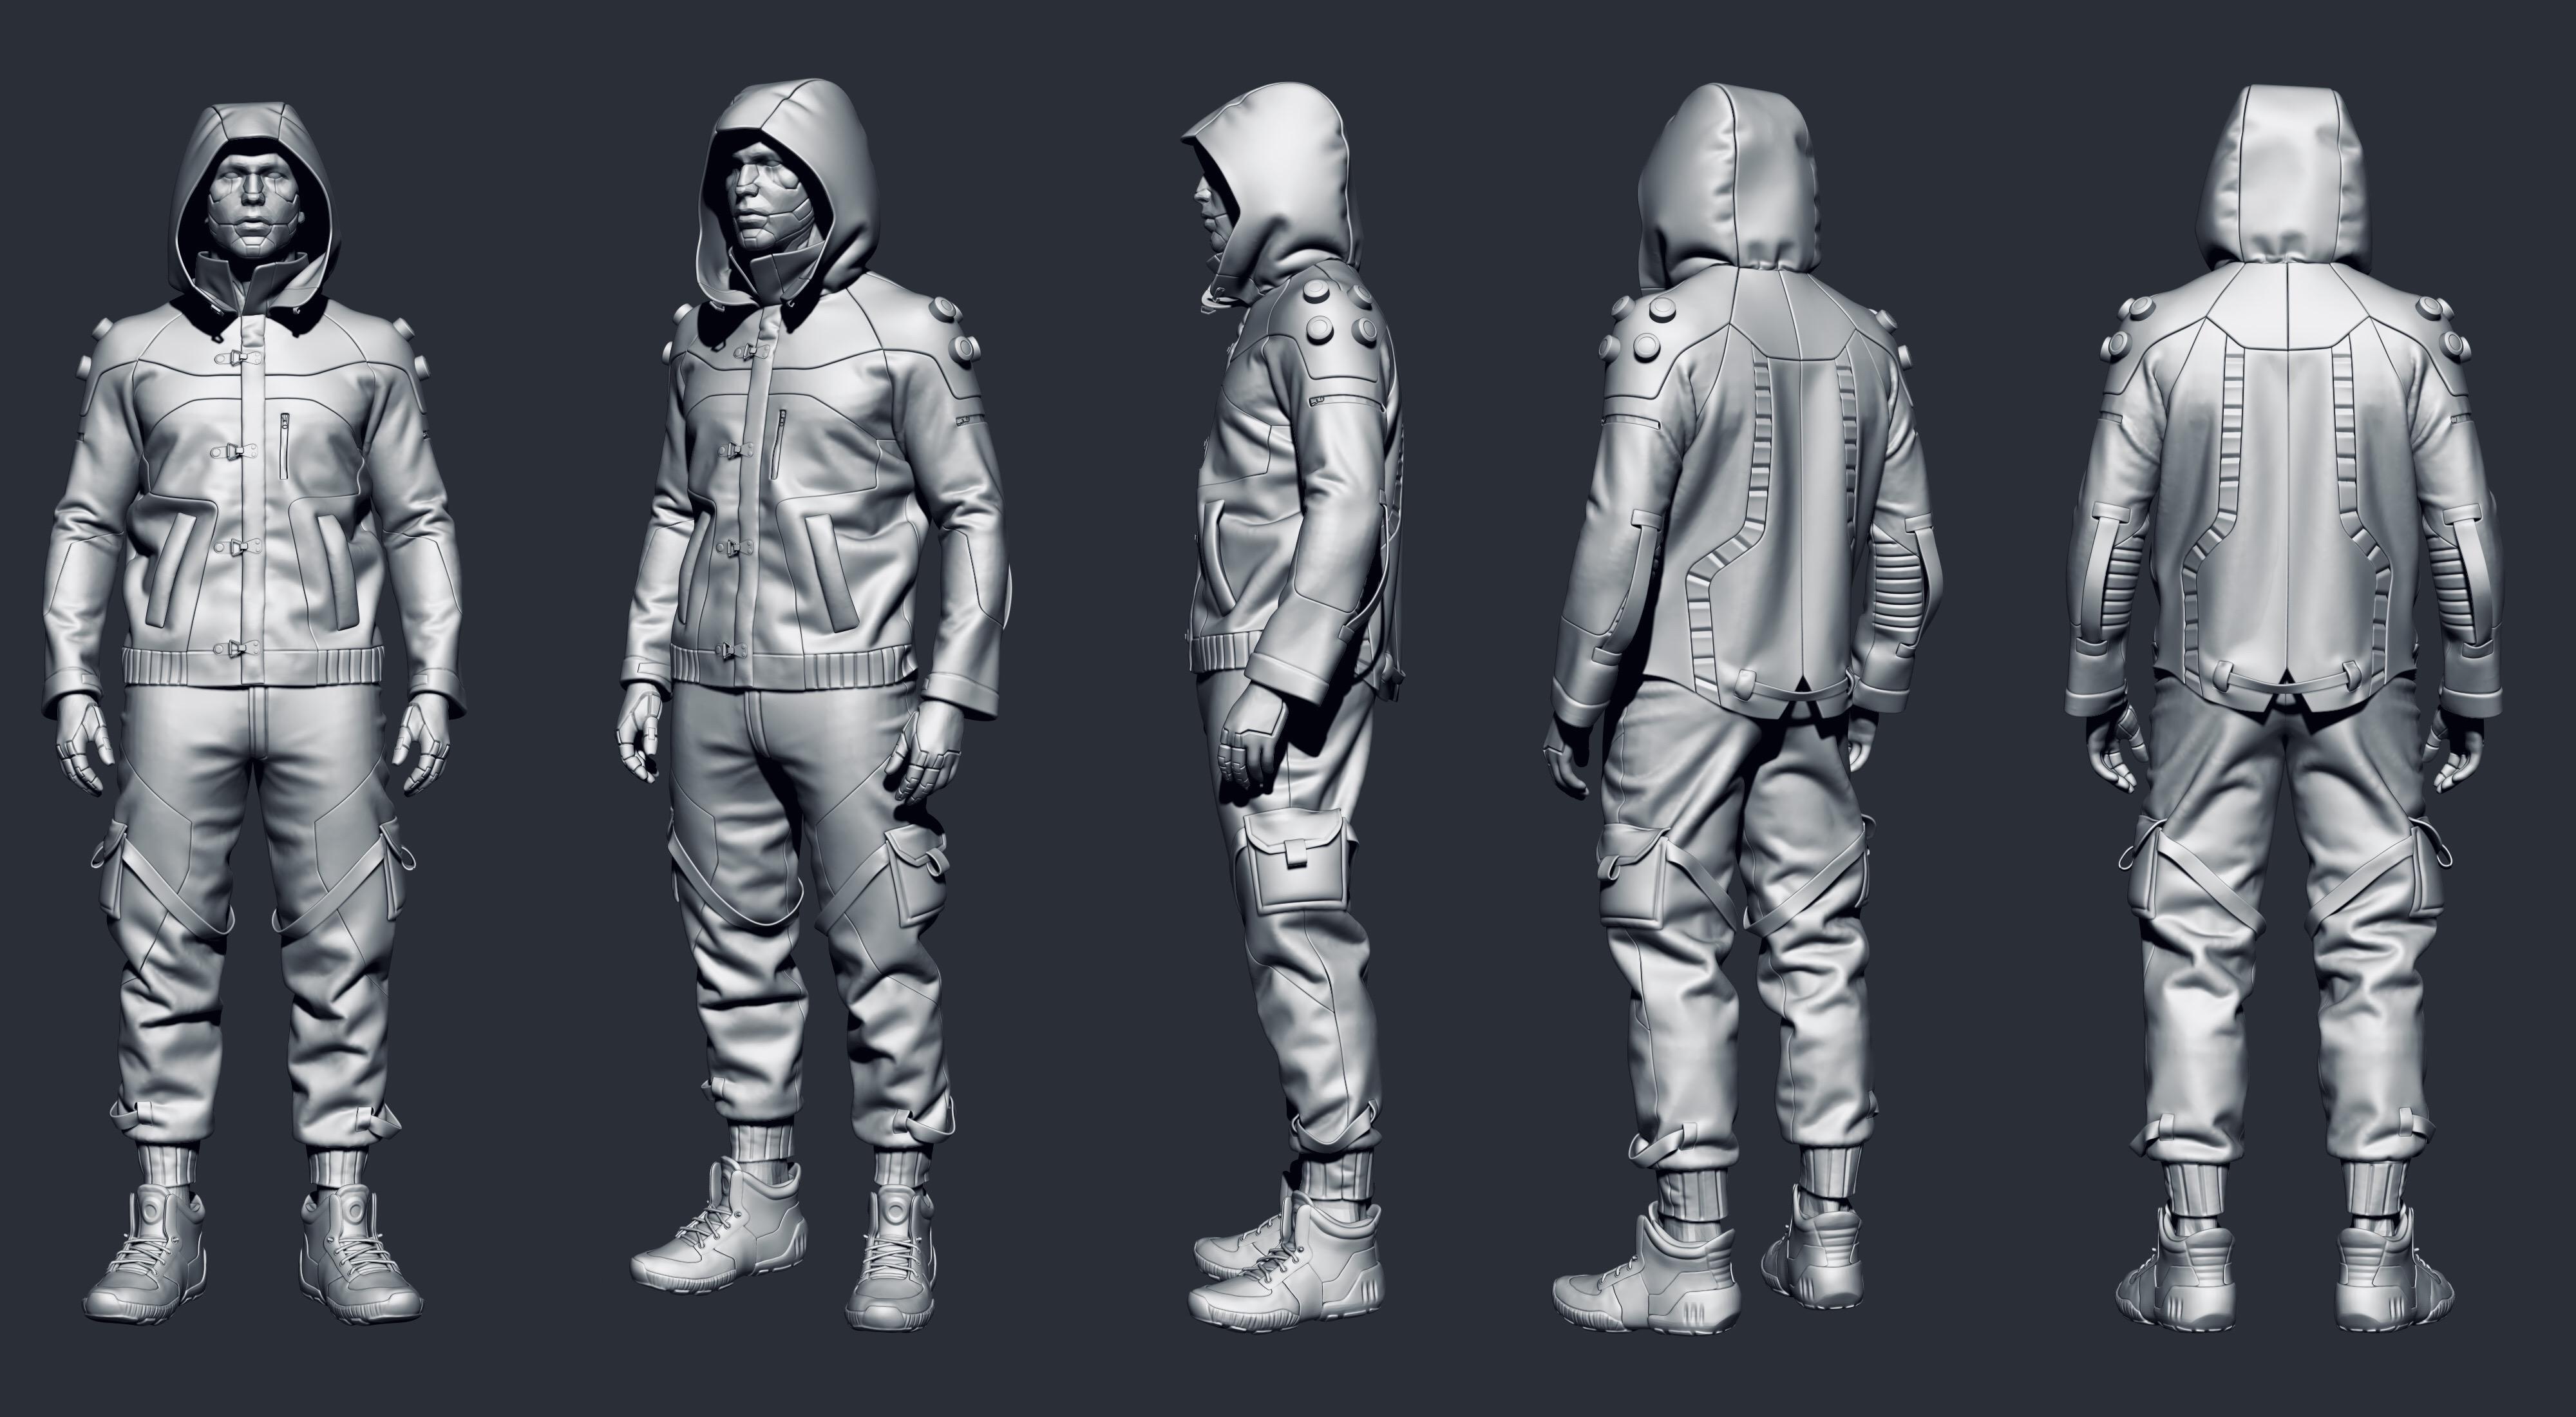 Cyberpunk street clothes